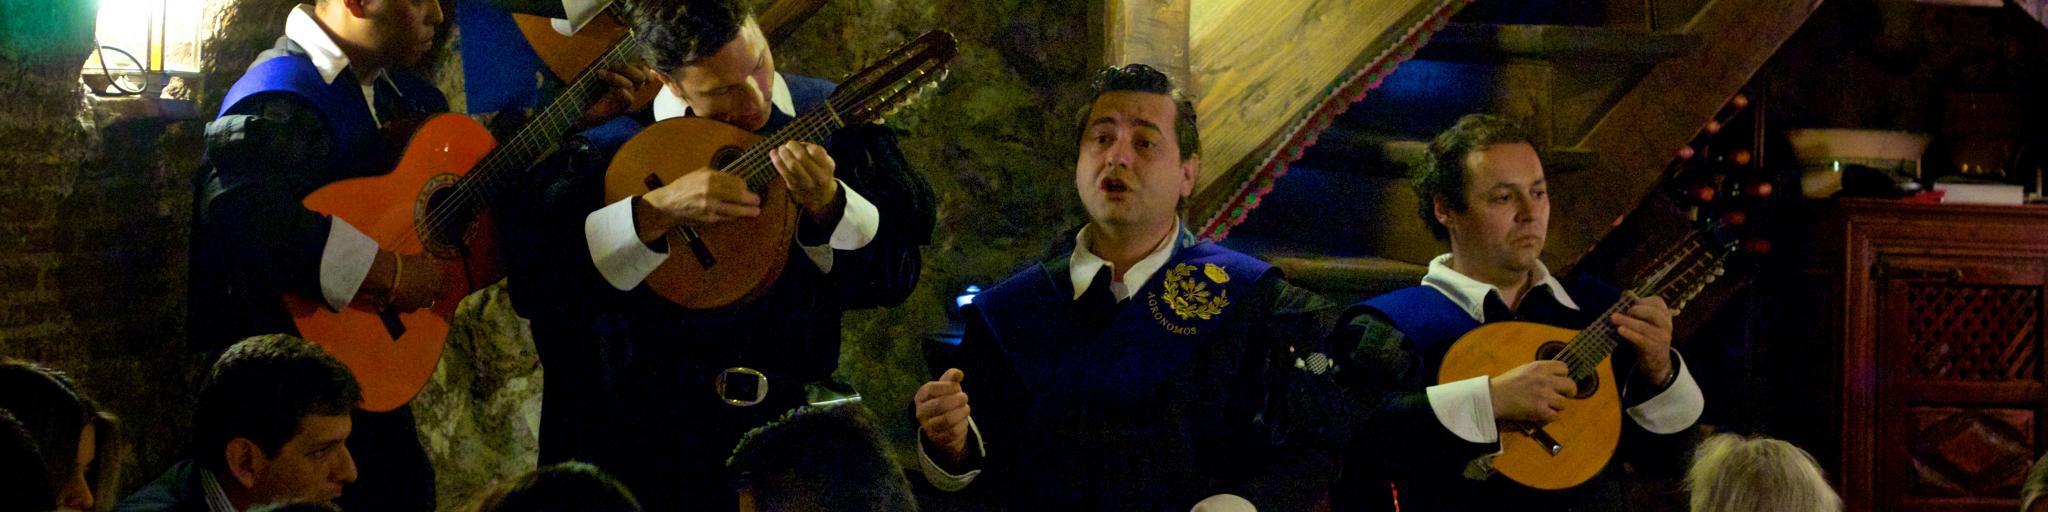 Singers and musicians serenade diners at Sobrino de Botin restaurant